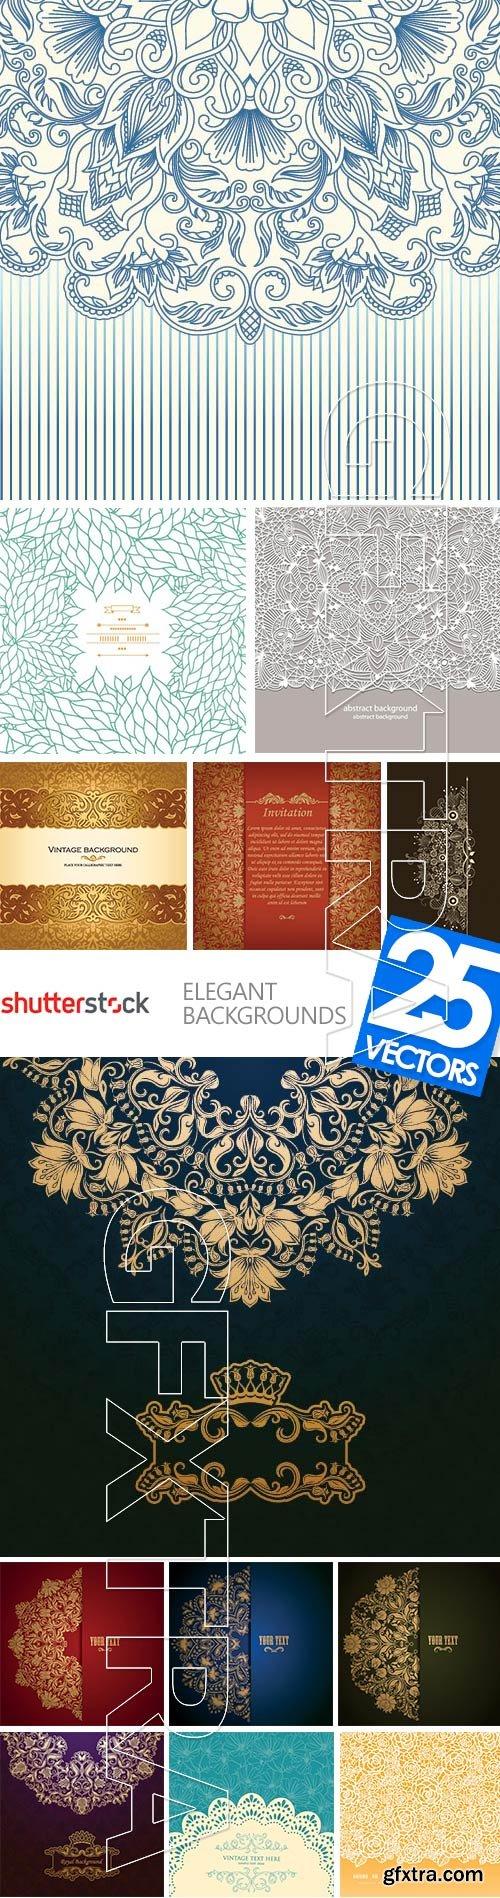 Elegant Backgrounds 25xEPS